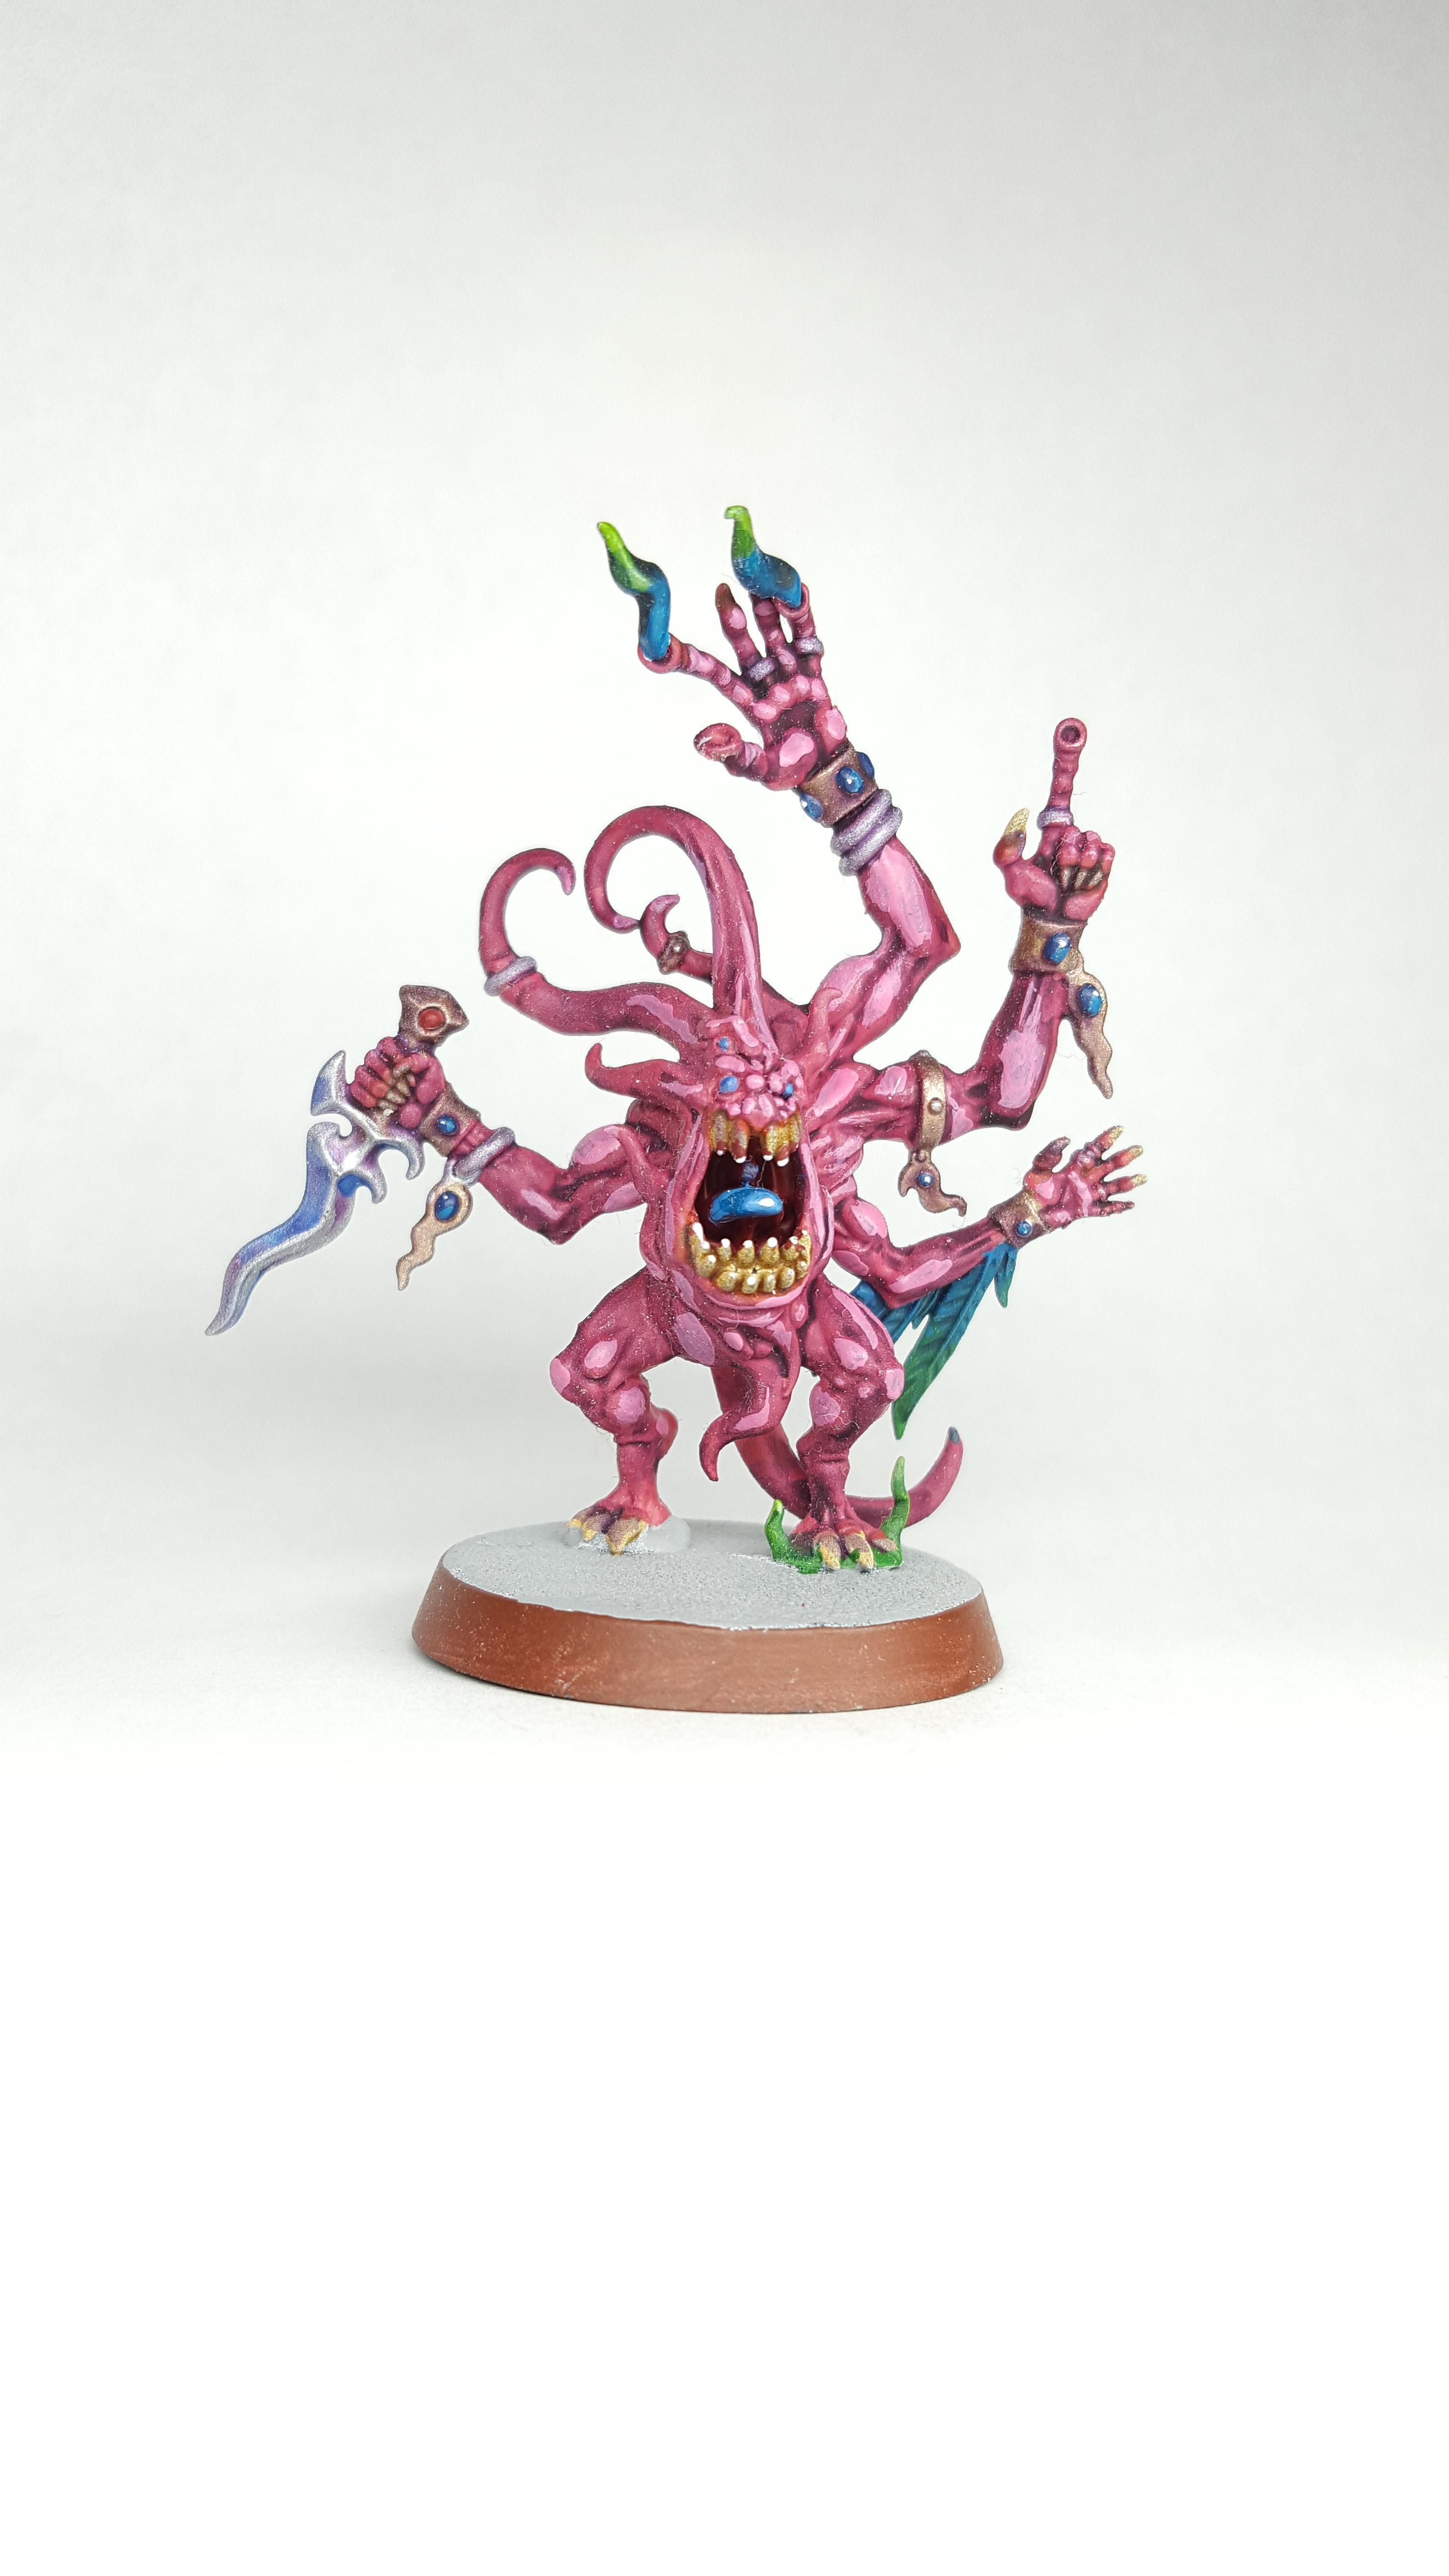 Chaos, Chaos Demon, Daemons, Games Workshop, Horrors, Pink Horror, Tzeentch, Warhammer 40,000, Warhammer Fantasy